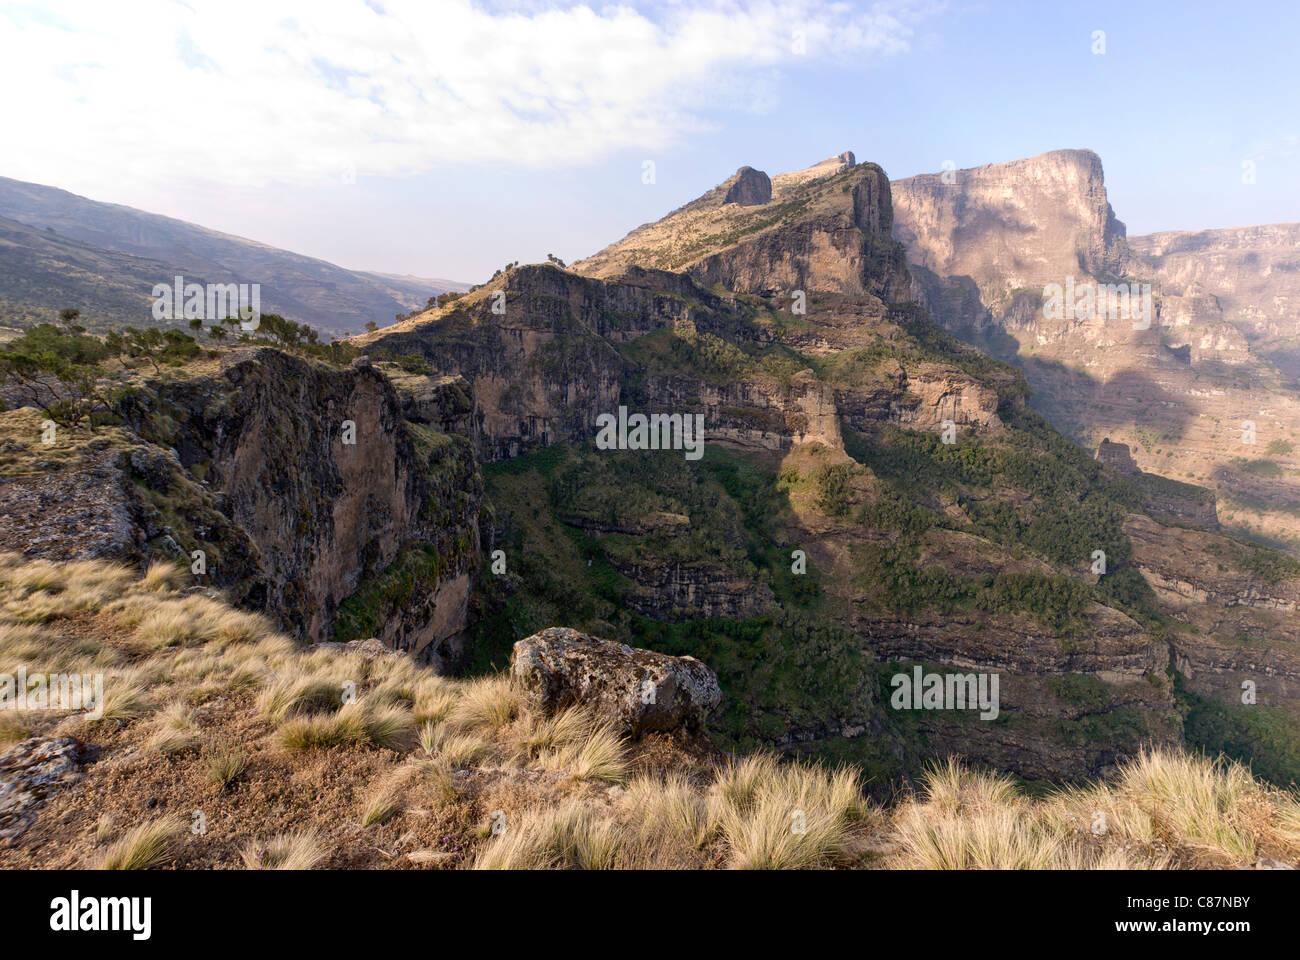 Ethiopia Simien escarpment landscape - Stock Image